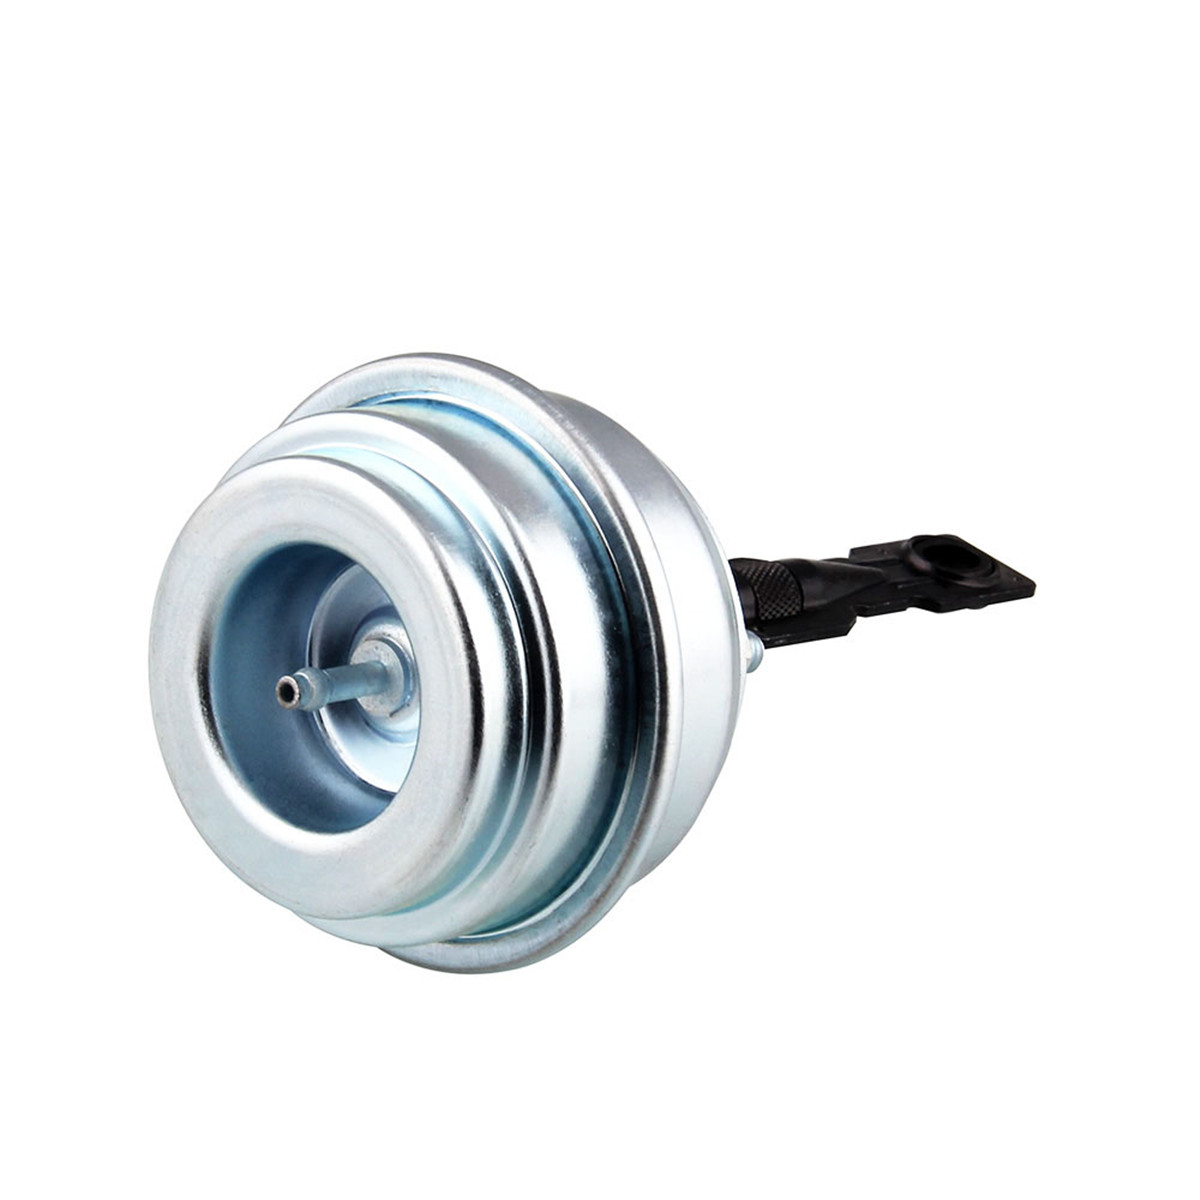 Turbo Wastegate Vacuum Actuator Zinc For VW 1.9 TDI ALH AHF AUY GT1749V 434855-0015